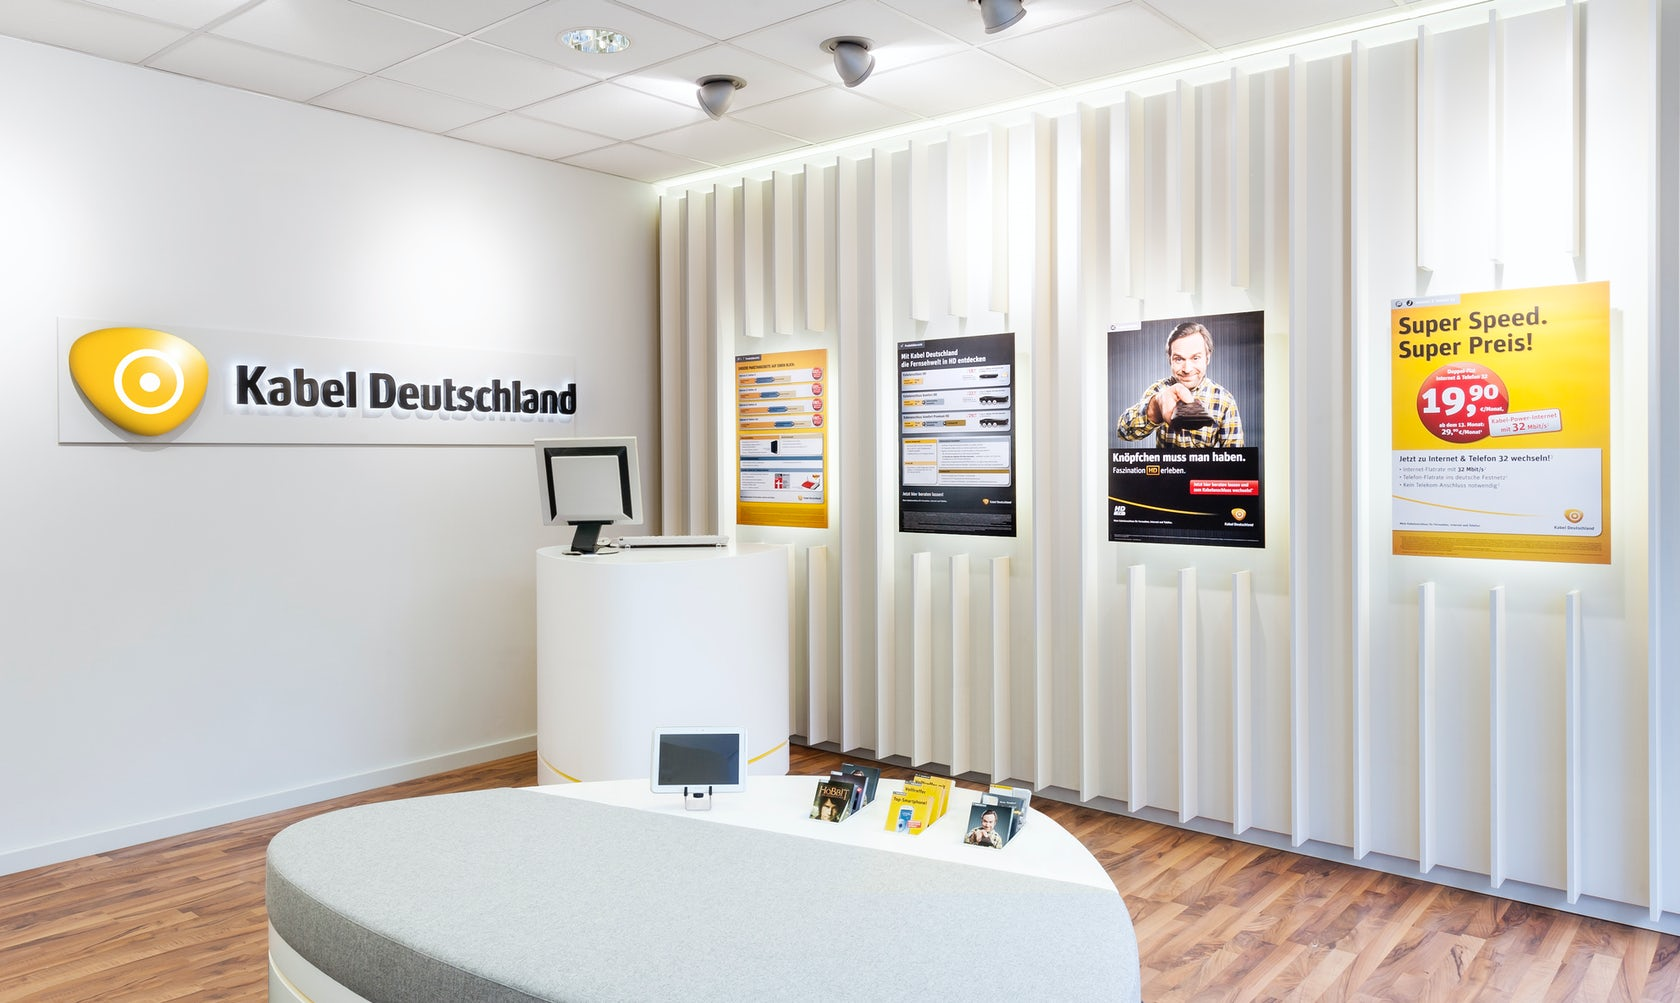 retail design kabel deutschland architizer. Black Bedroom Furniture Sets. Home Design Ideas